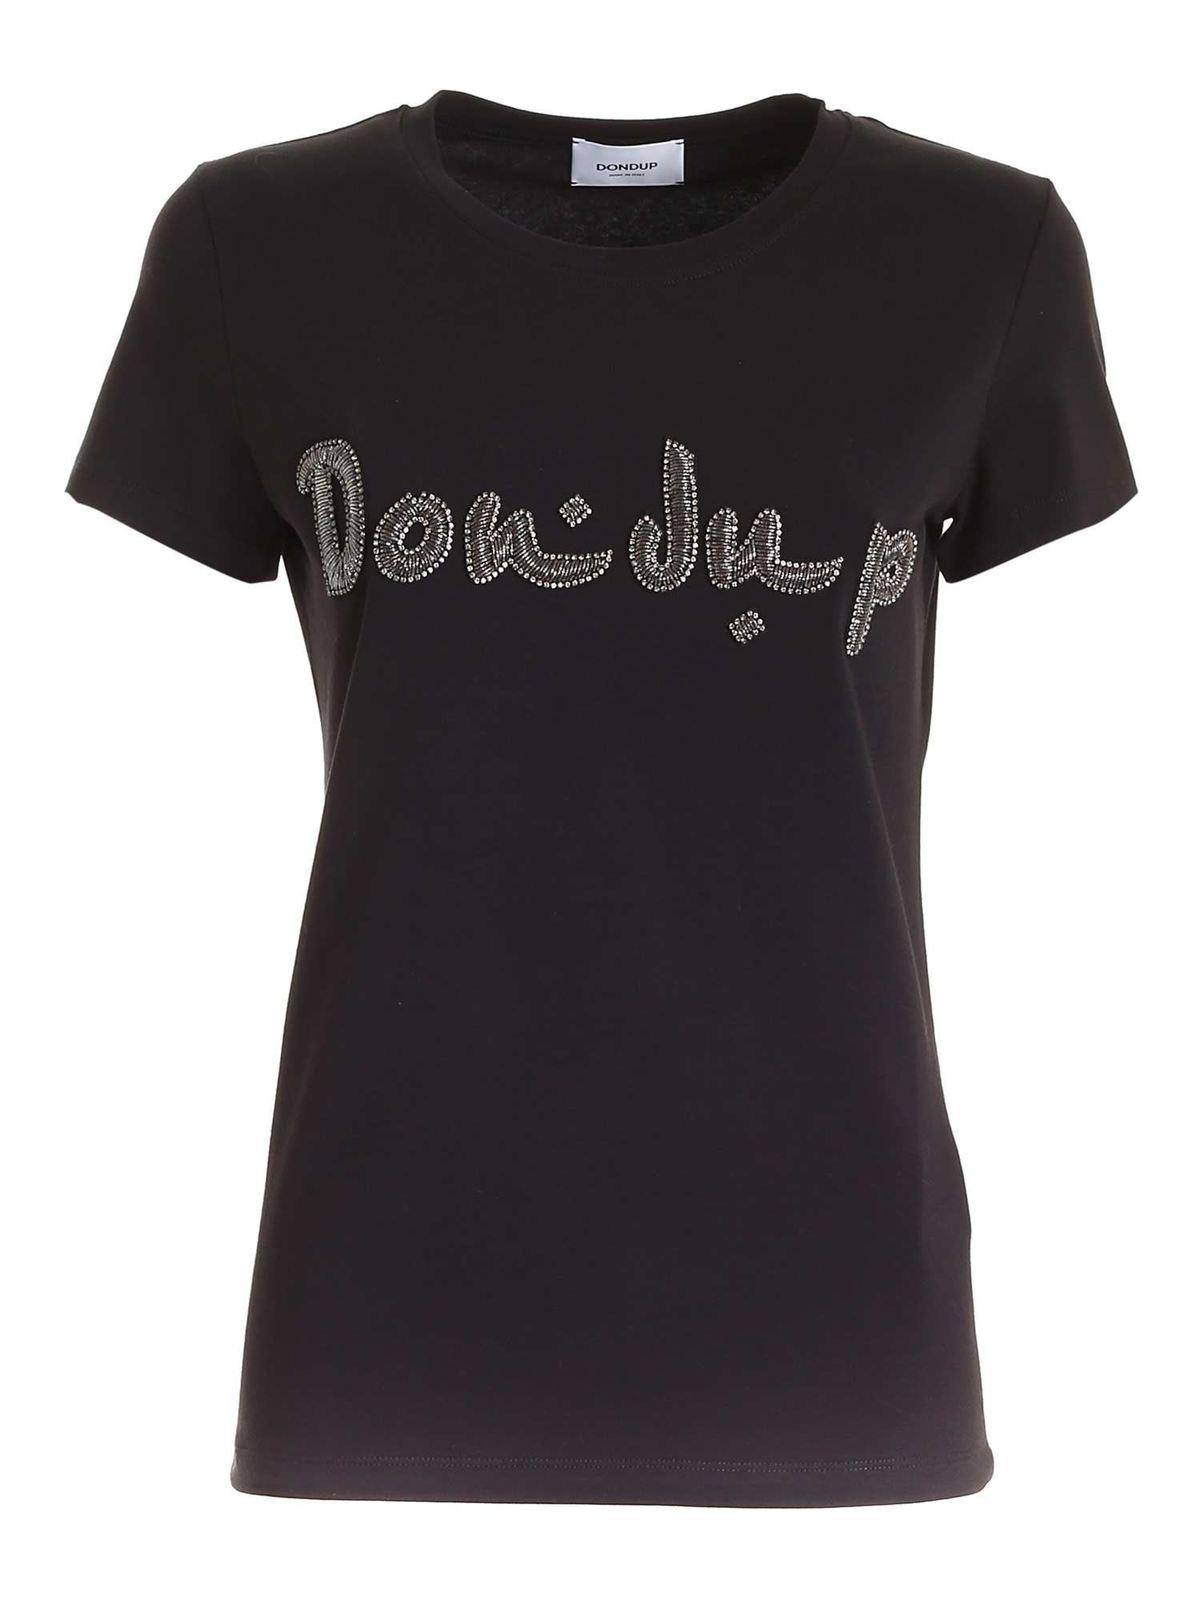 Dondup Cottons RHINESTONE LOGO T-SHIRT IN BLACK